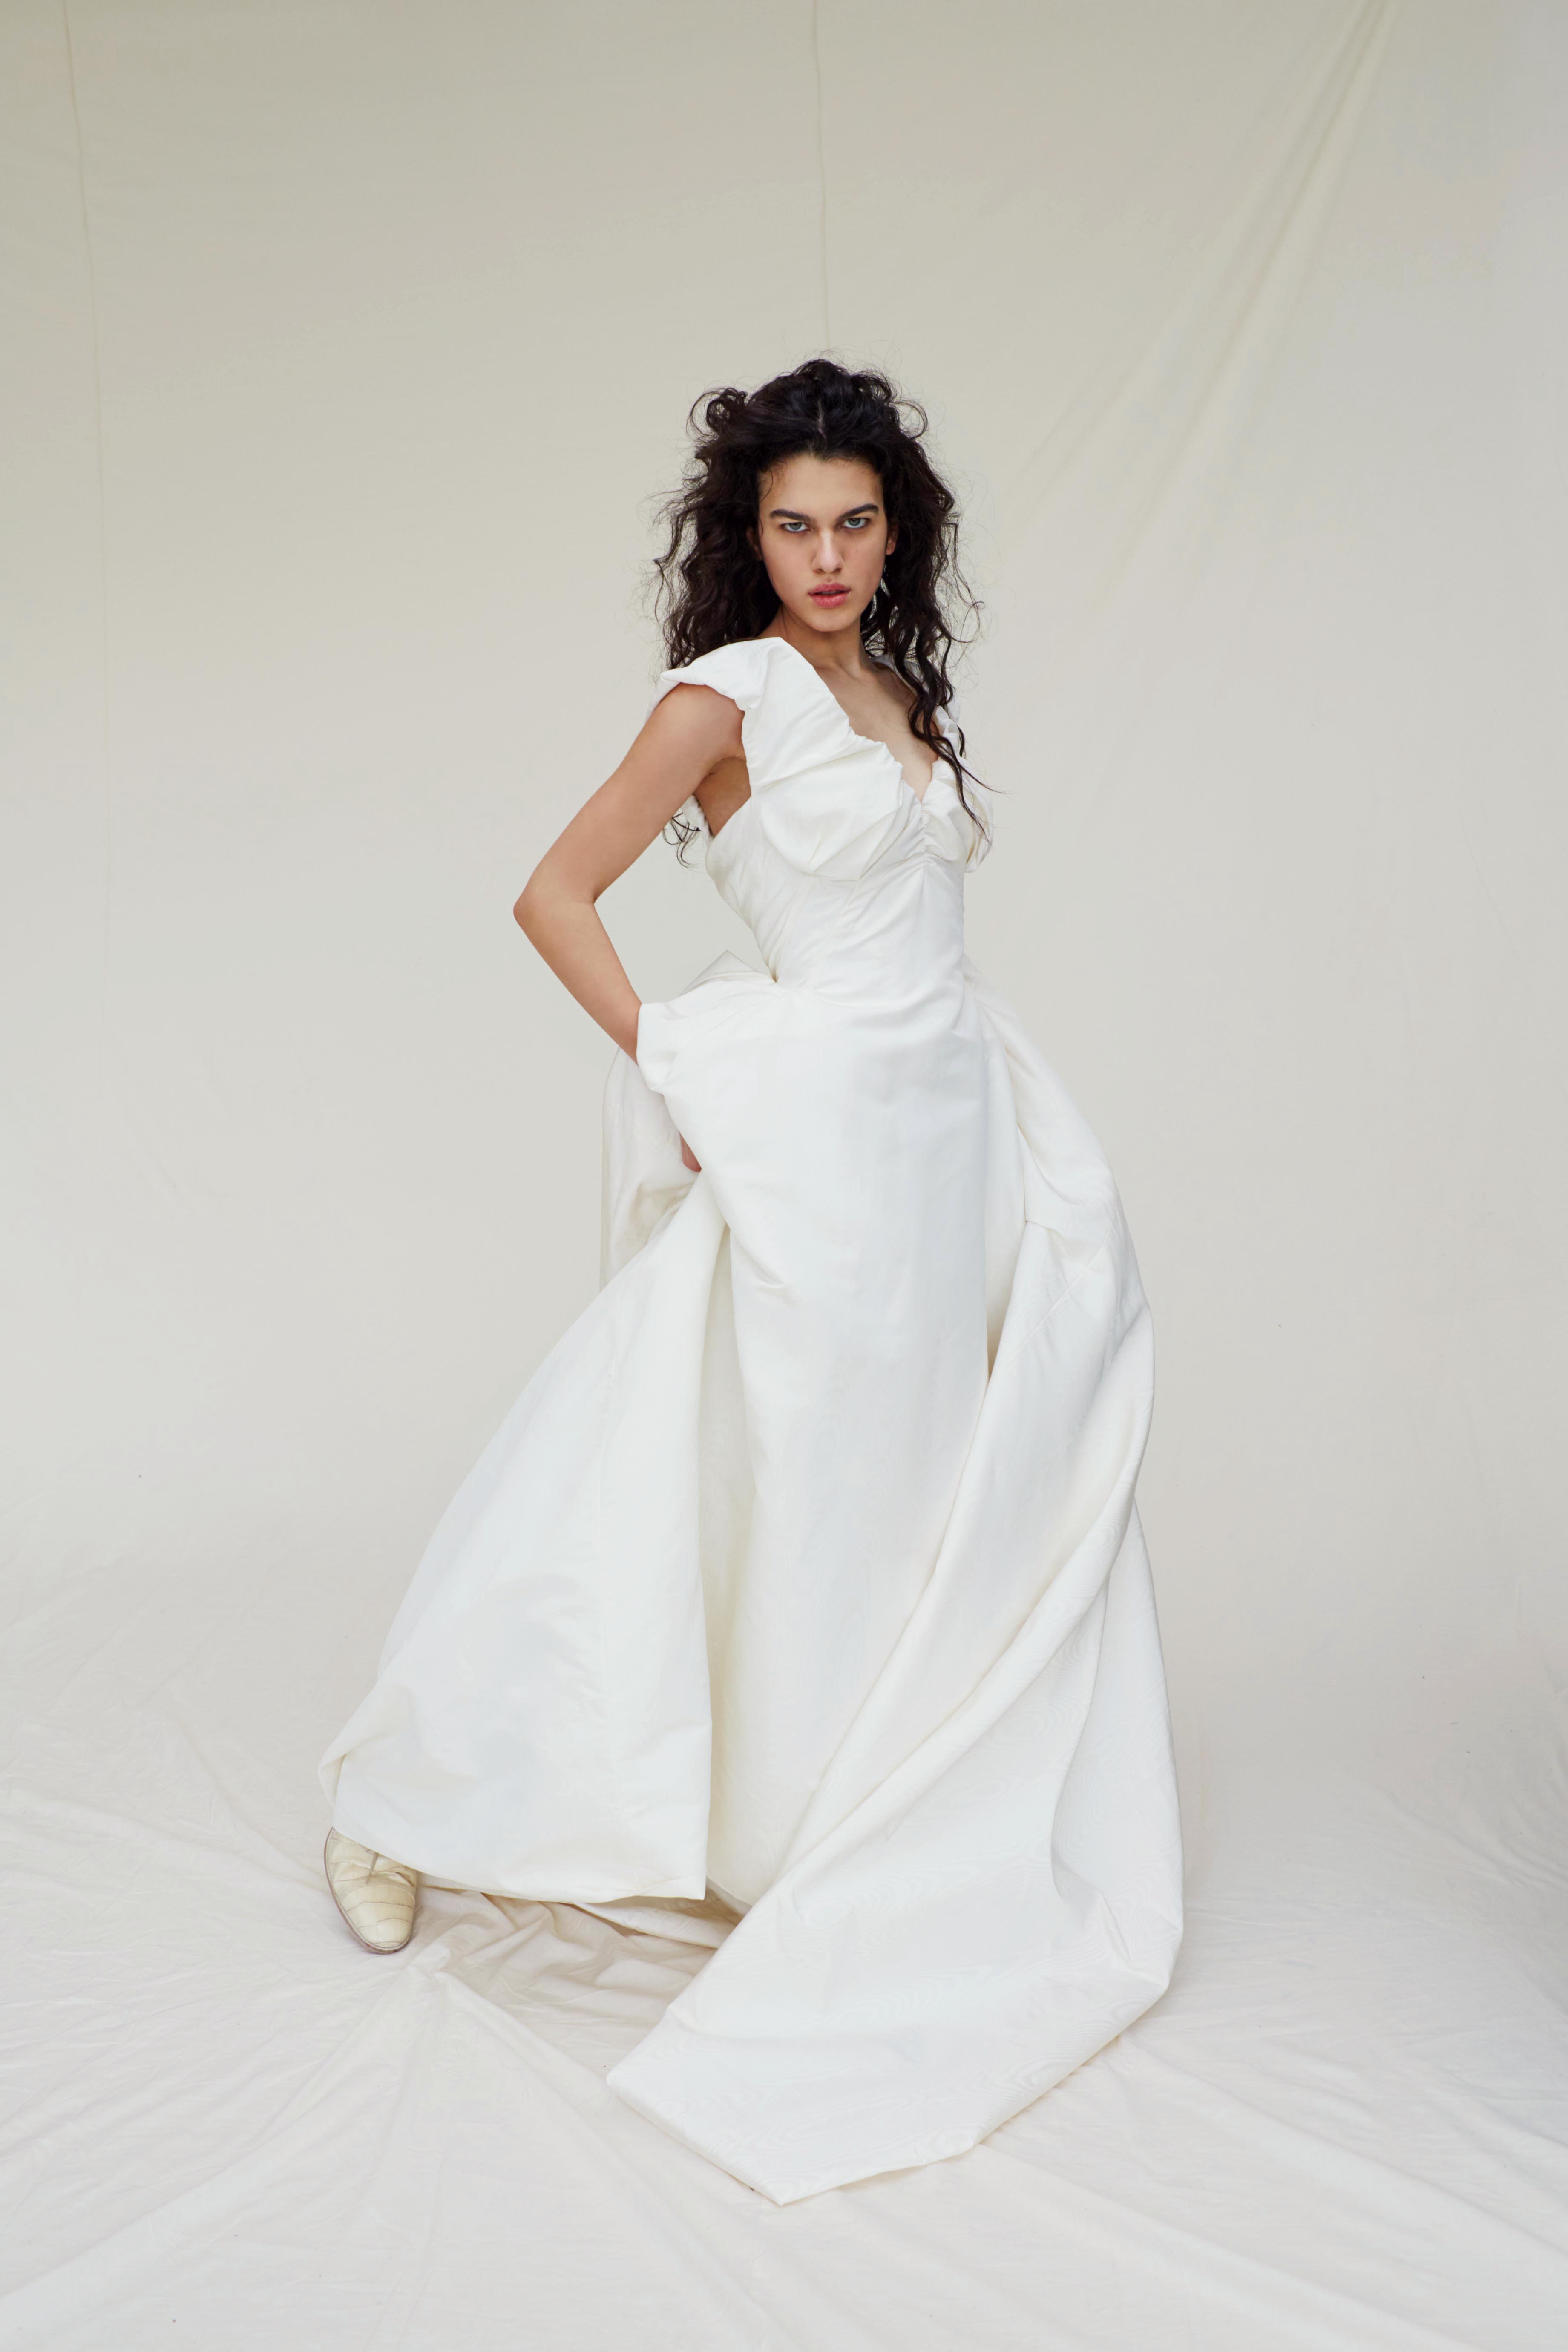 vivienne westwood wedding dress Spring 2019 a-line ruched neckline